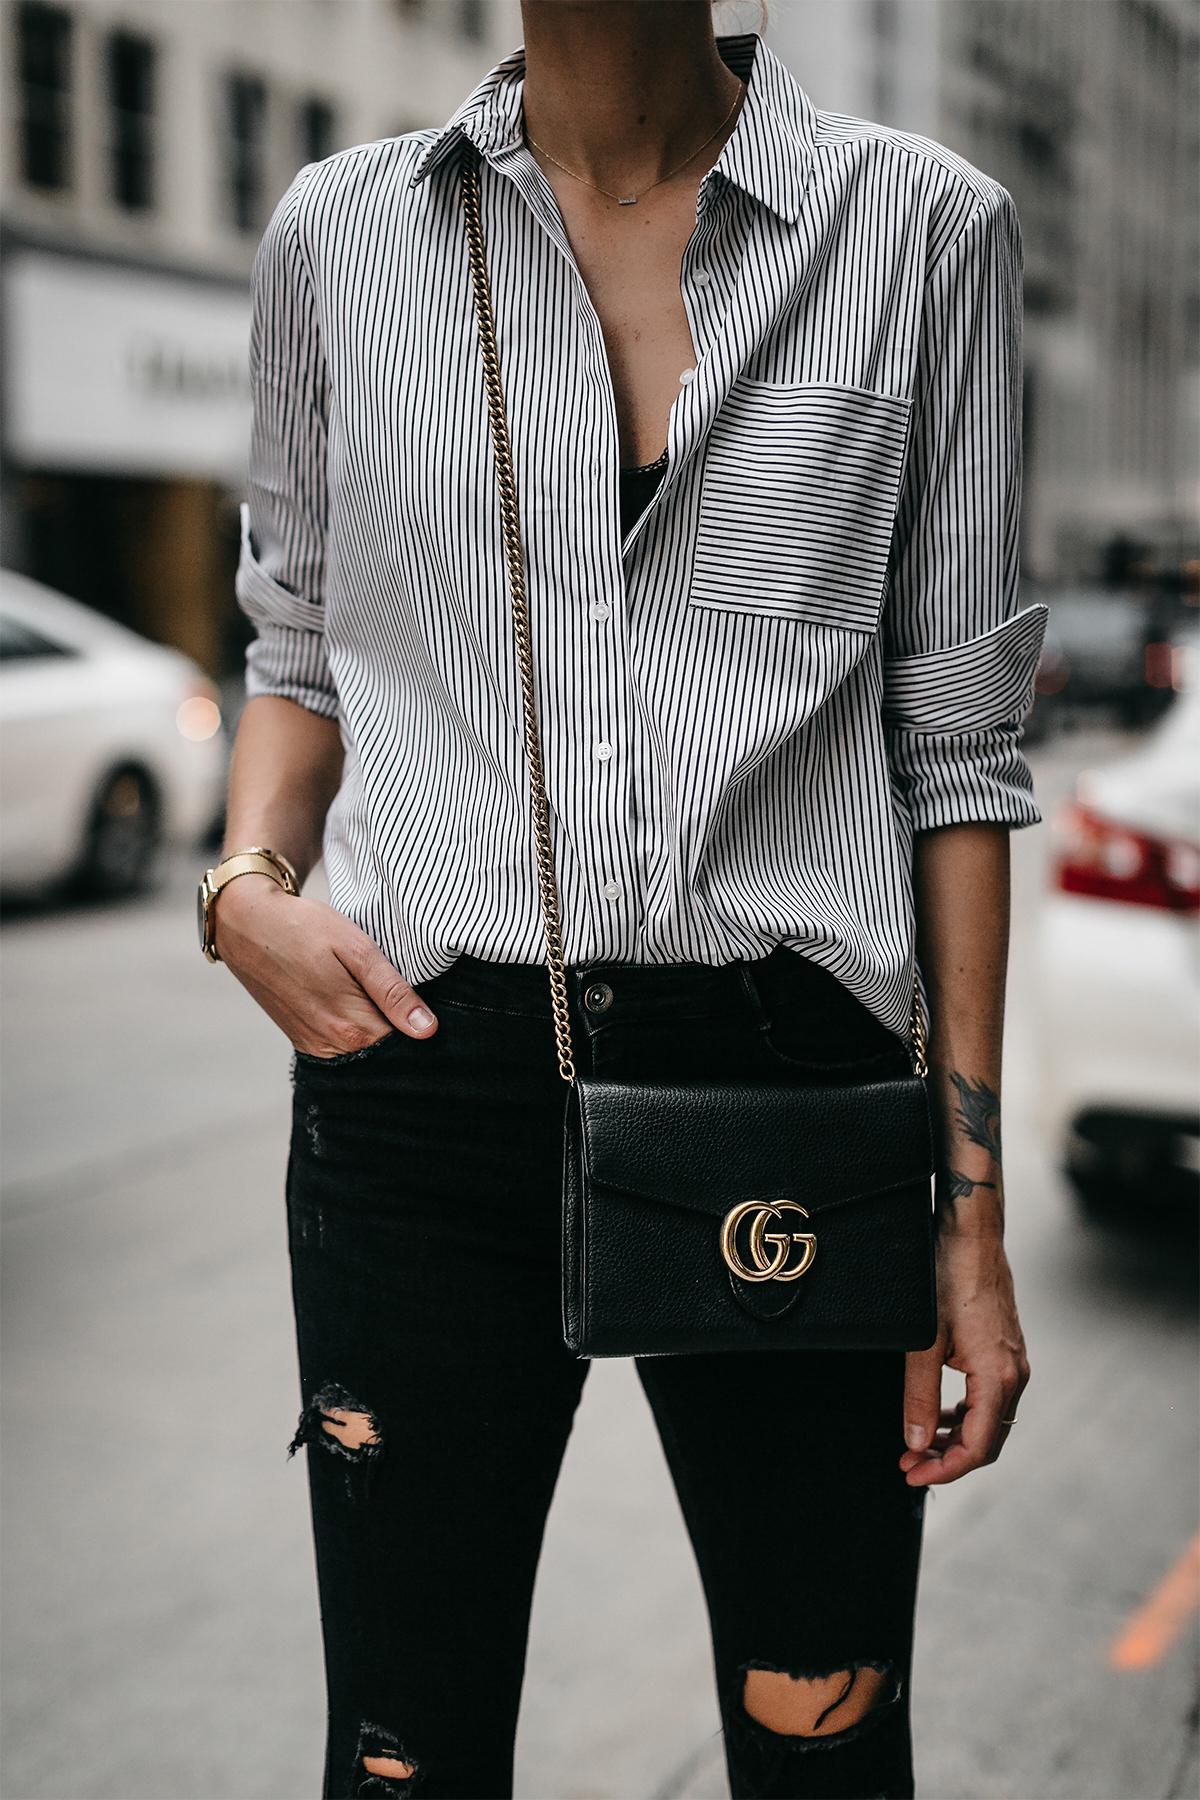 Black White Striped Button Down Shirt Gucci Handbag Black Ripped Skinny Jeans Fashion Jackson Dallas Blogger Fashion Blogger Street Styel